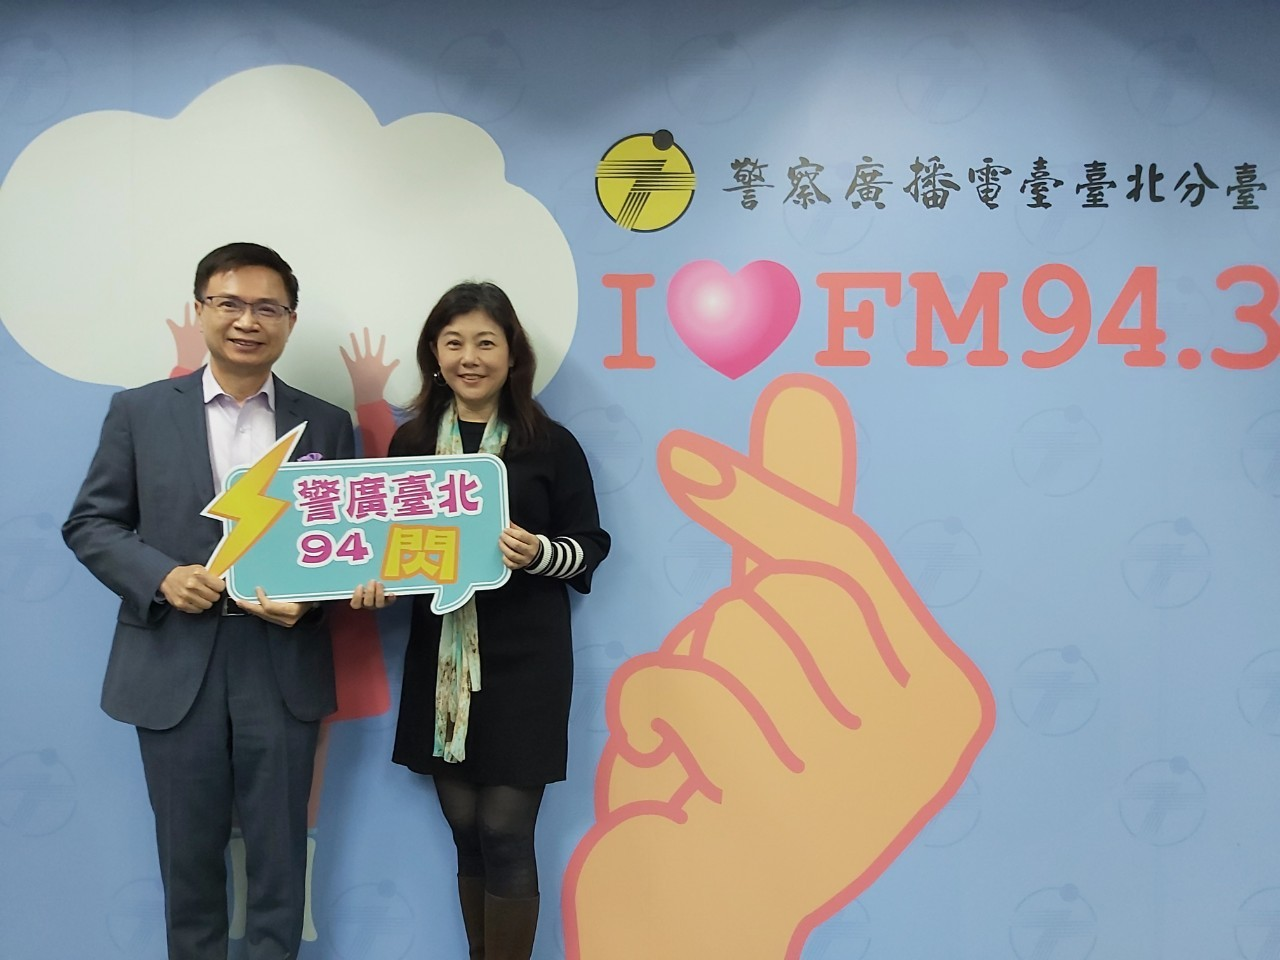 外貿協會2035 E-Mobility Taiwan